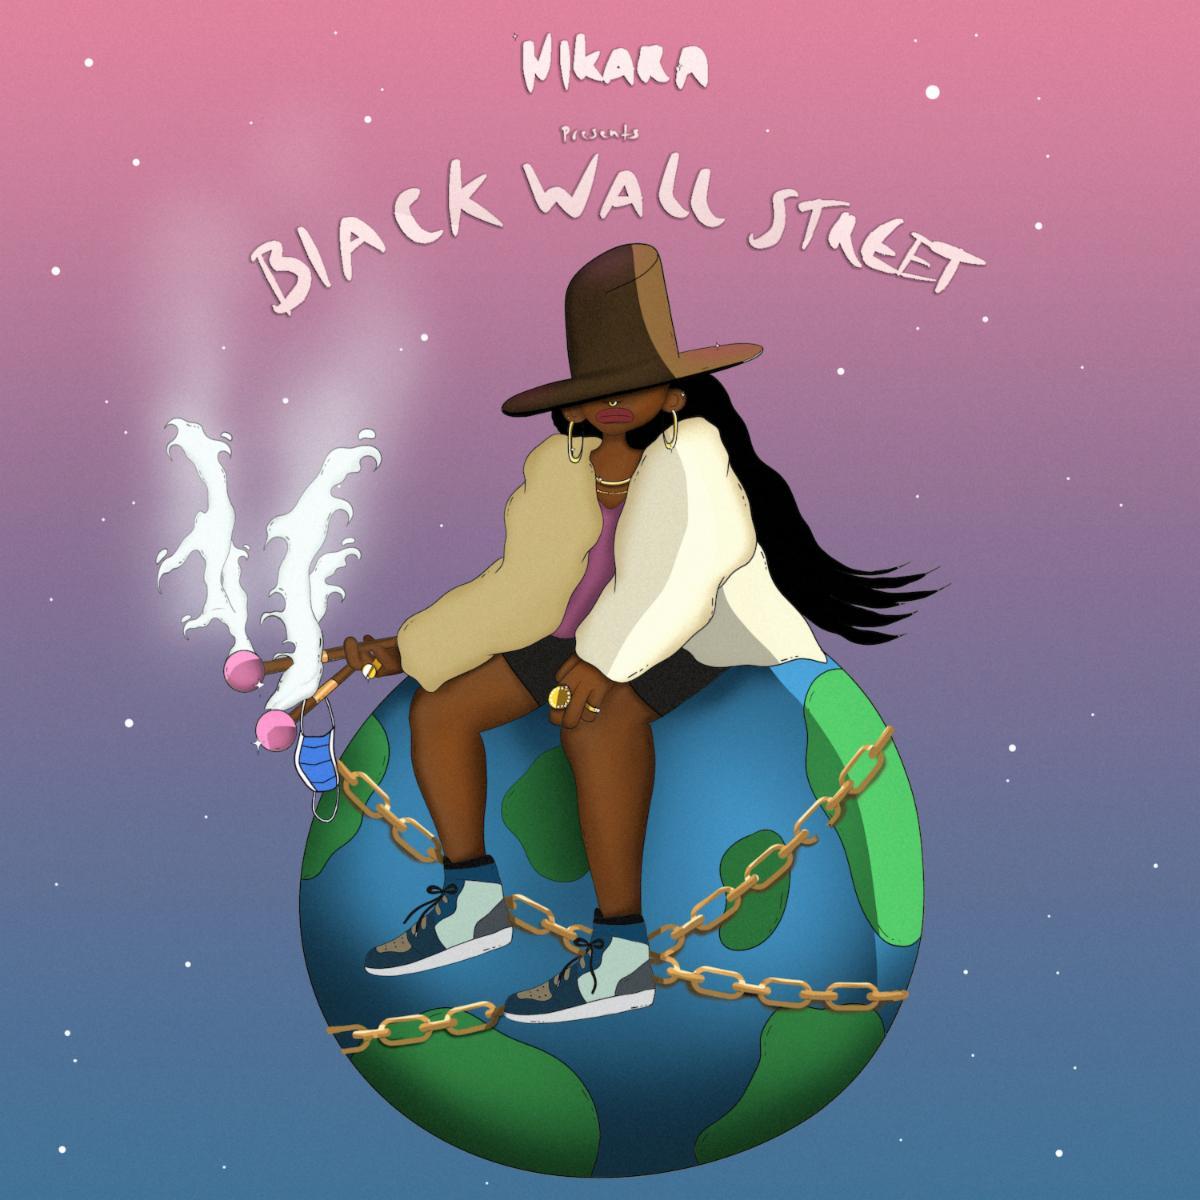 Black Wall Street via Big Hassle Media for use by 360 Magazine